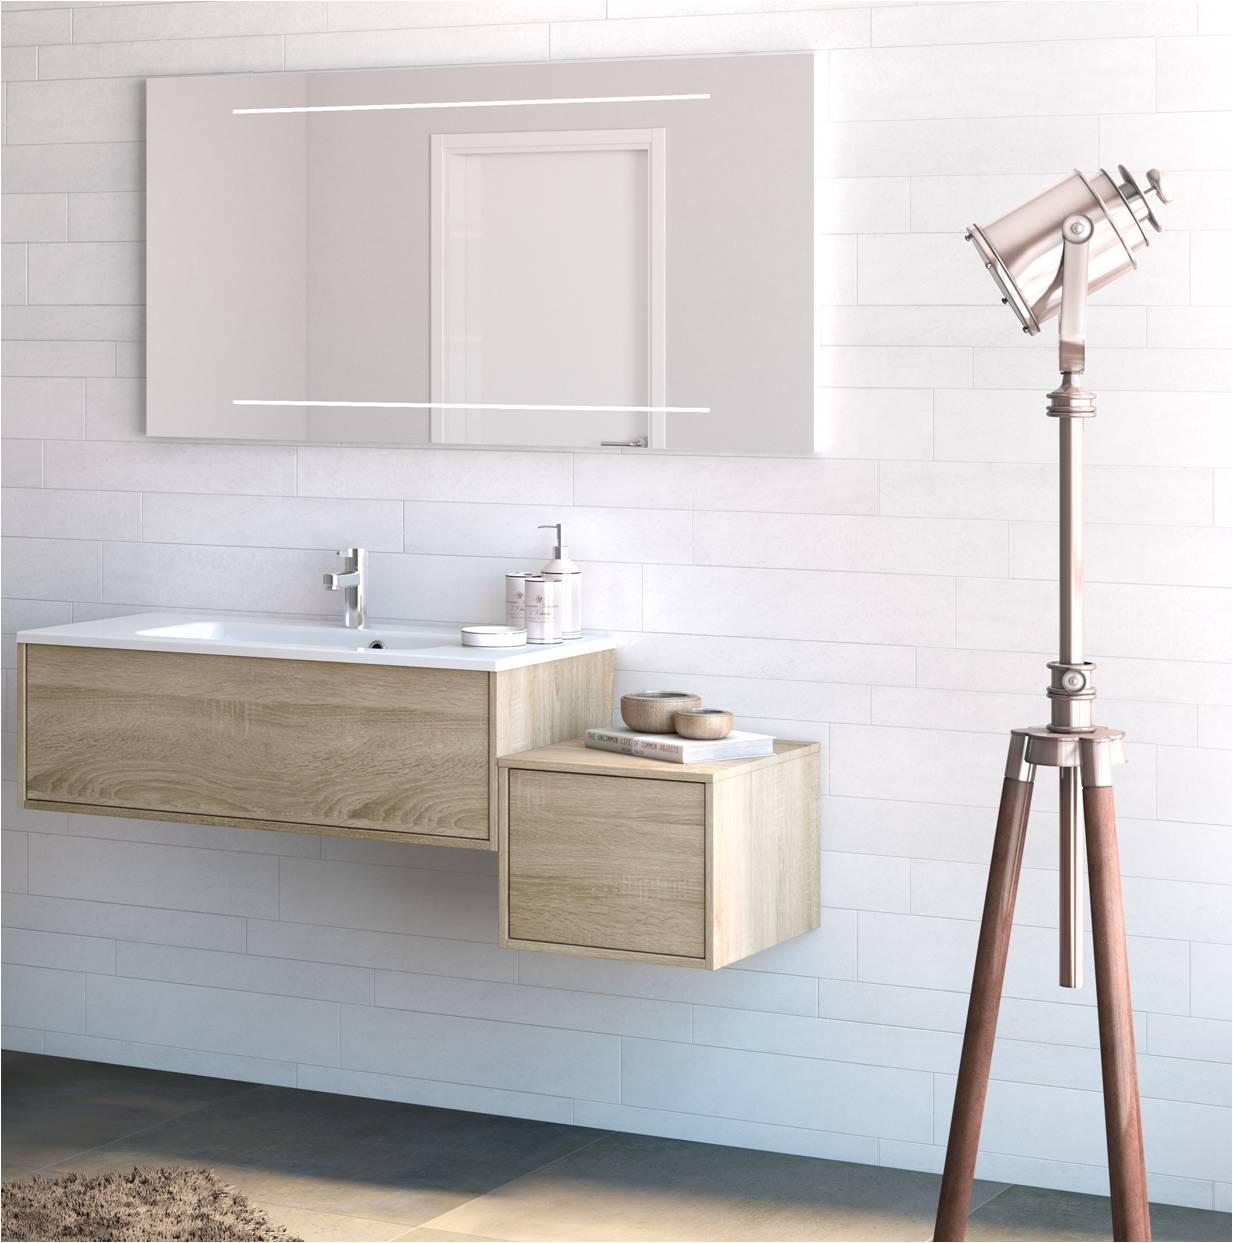 Meuble Salle De Bain Aquarine Prefixe ~ meuble baroc aquarine great medium size of mesure sur changer bain